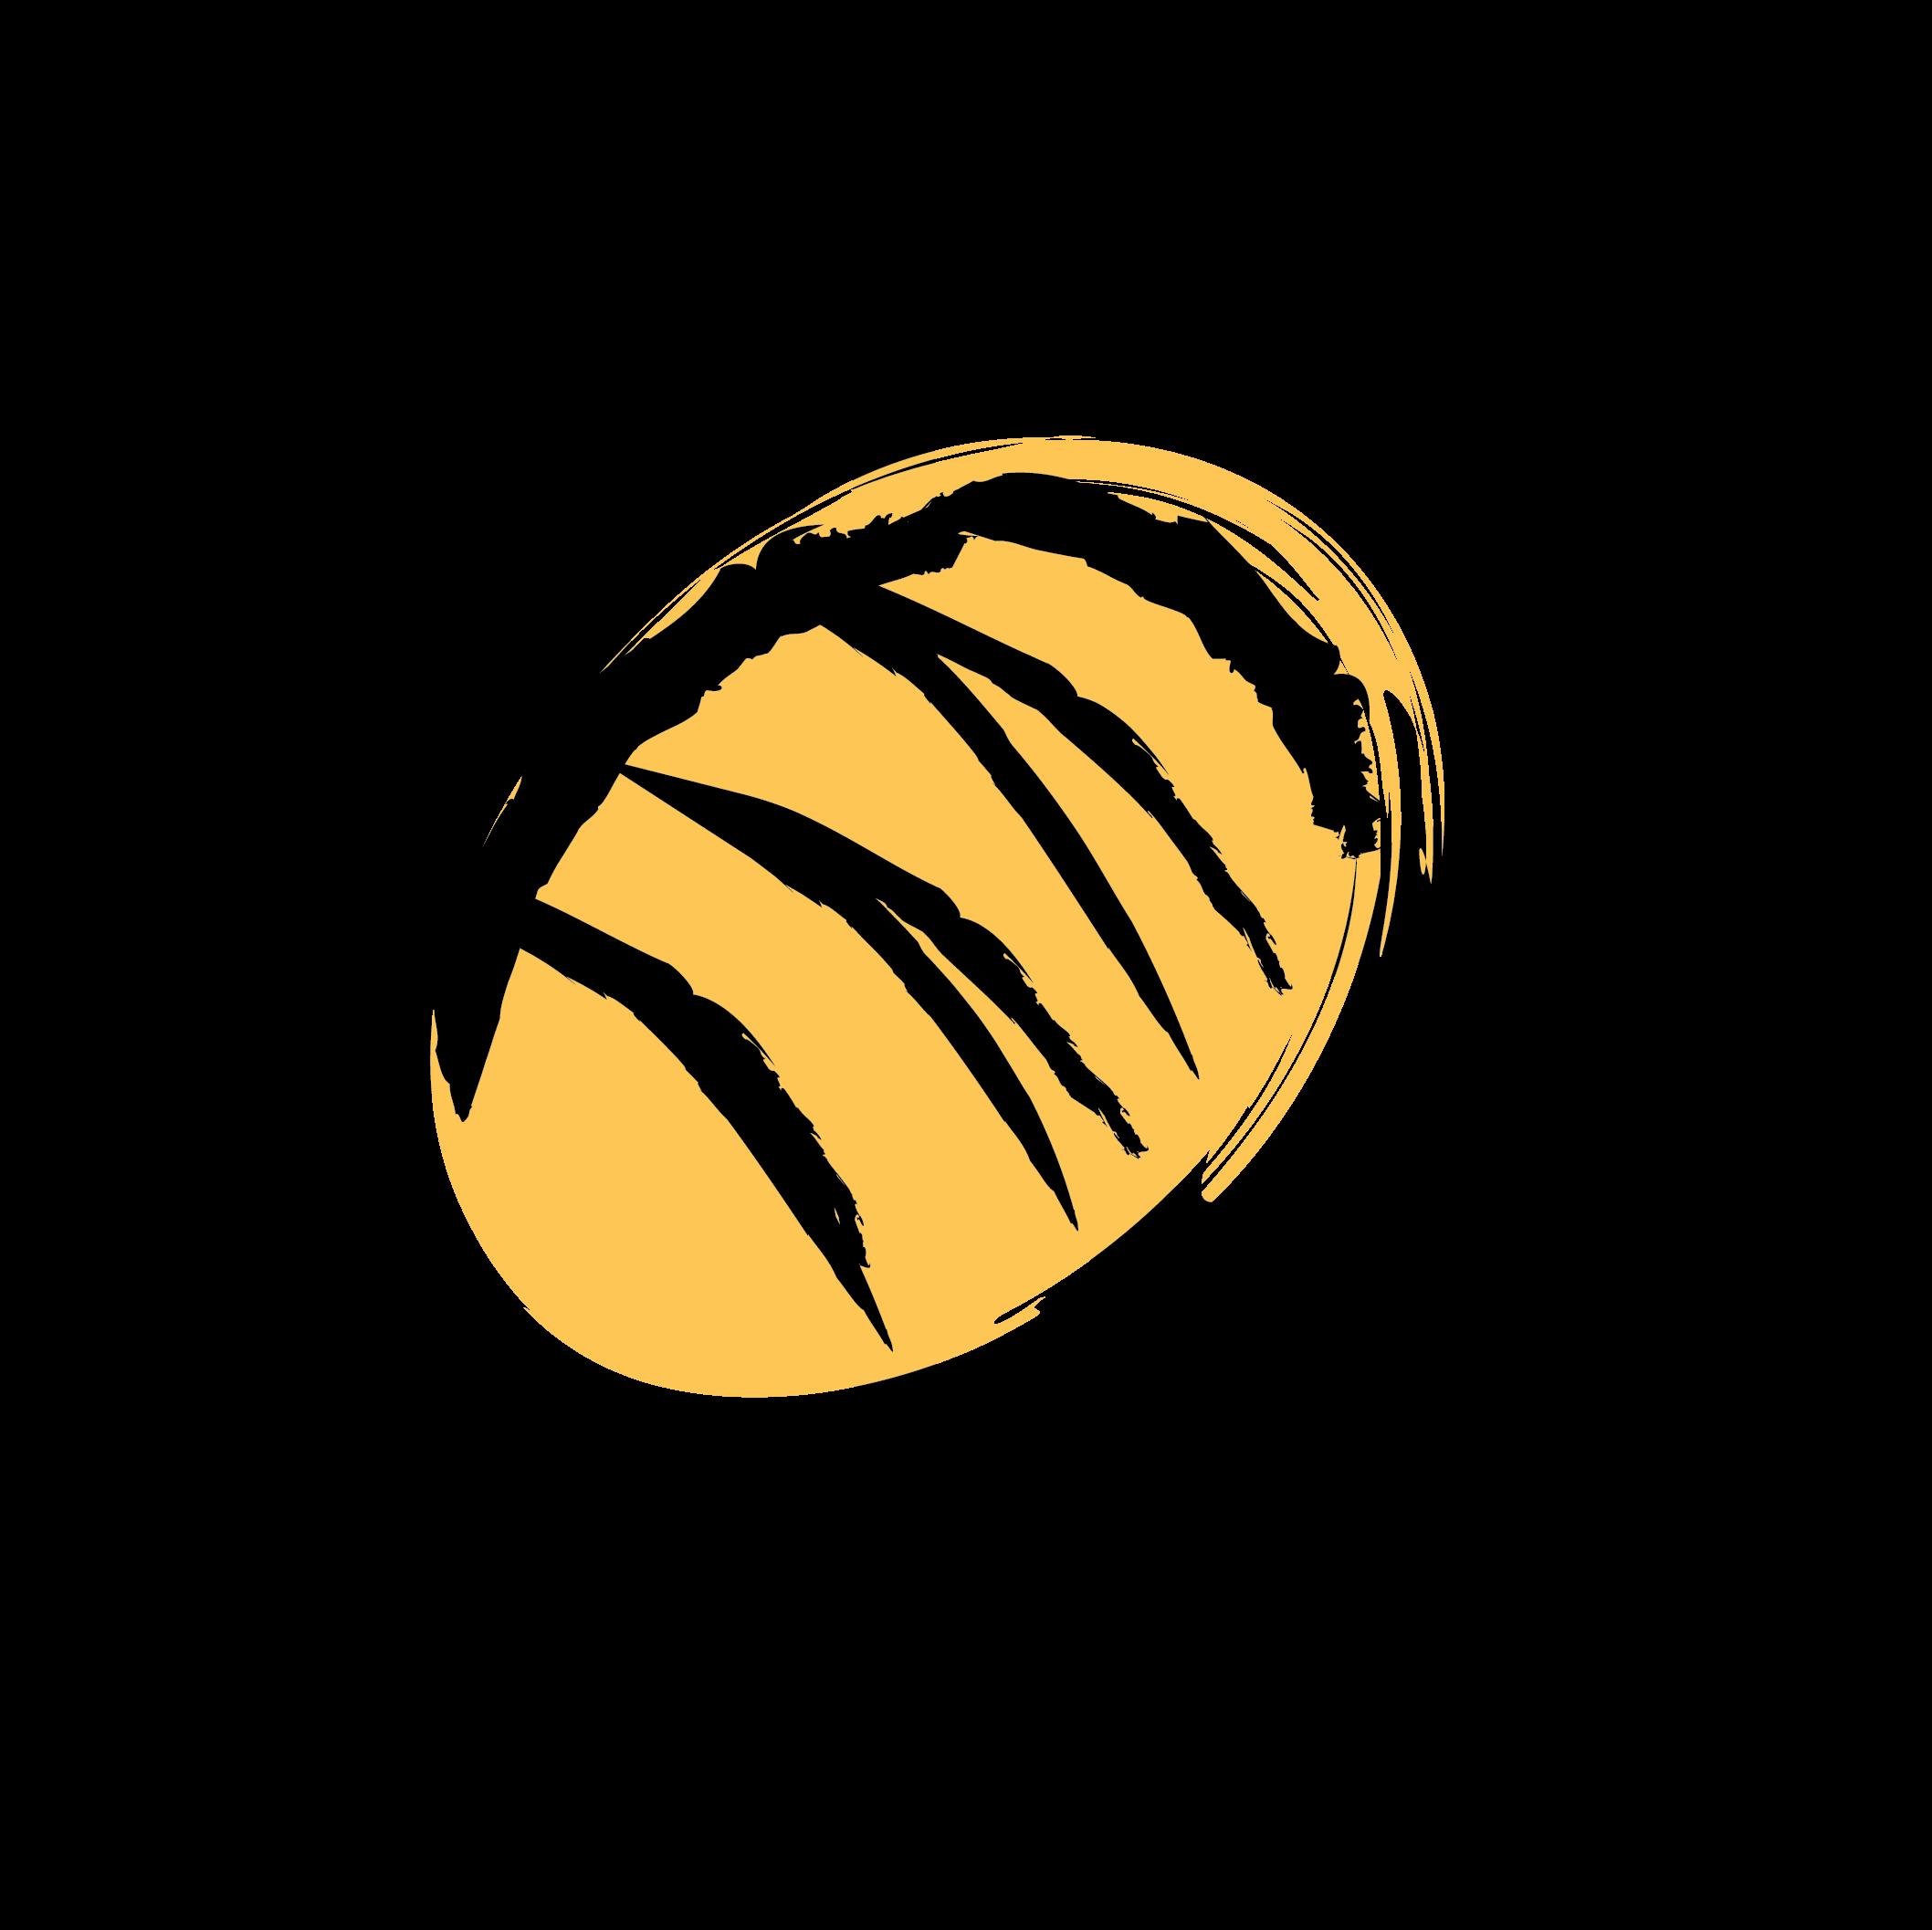 bee tube   bee tube  twitter clip art bumble bee black & white clip art bumble bee black & white